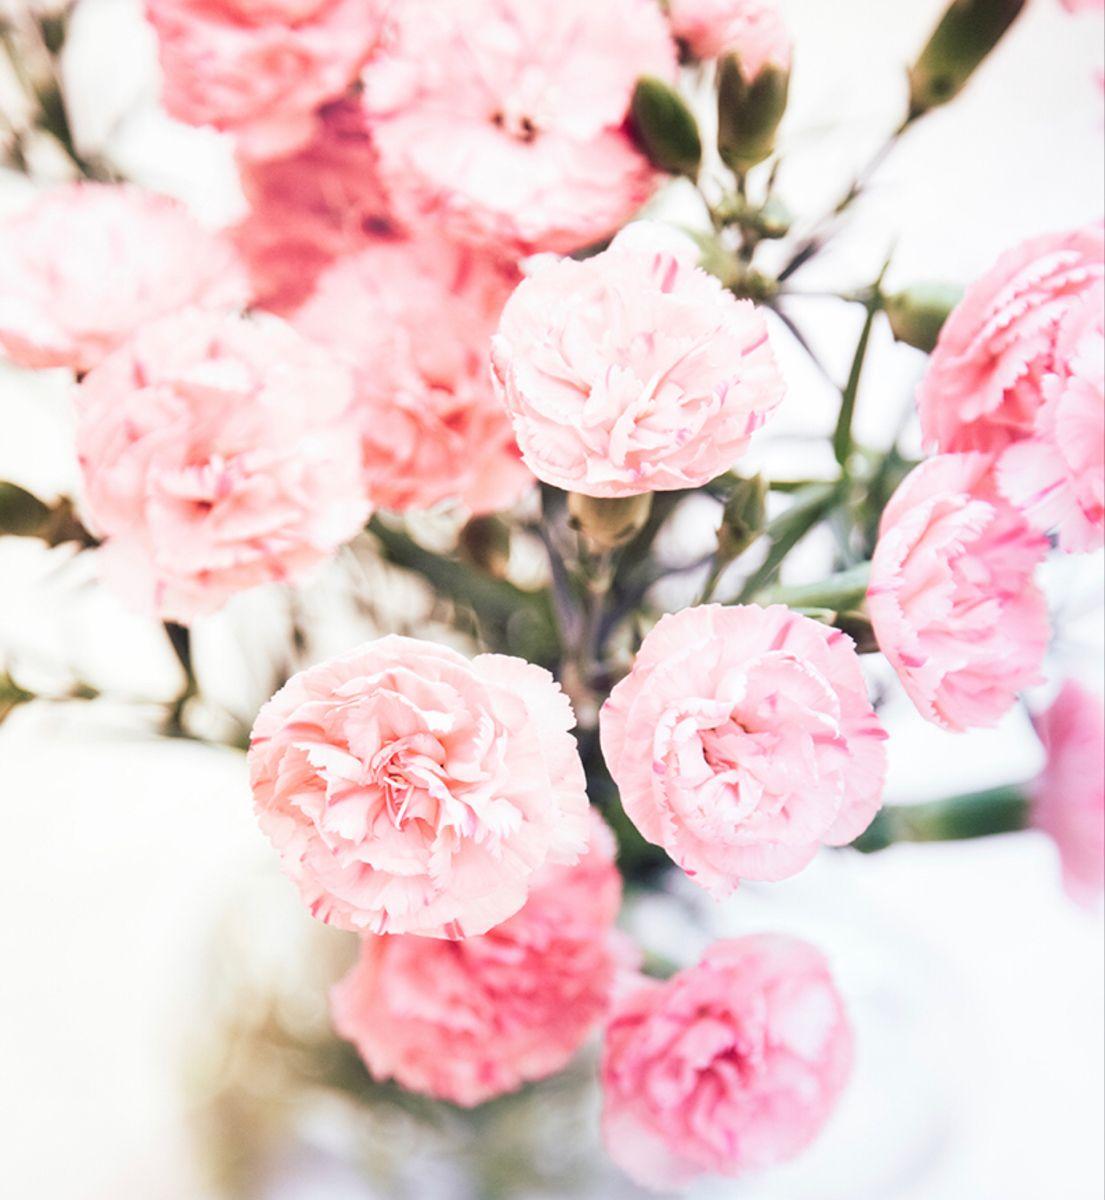 Pink Carnation In 2020 Carnations Pink Carnations Flowers